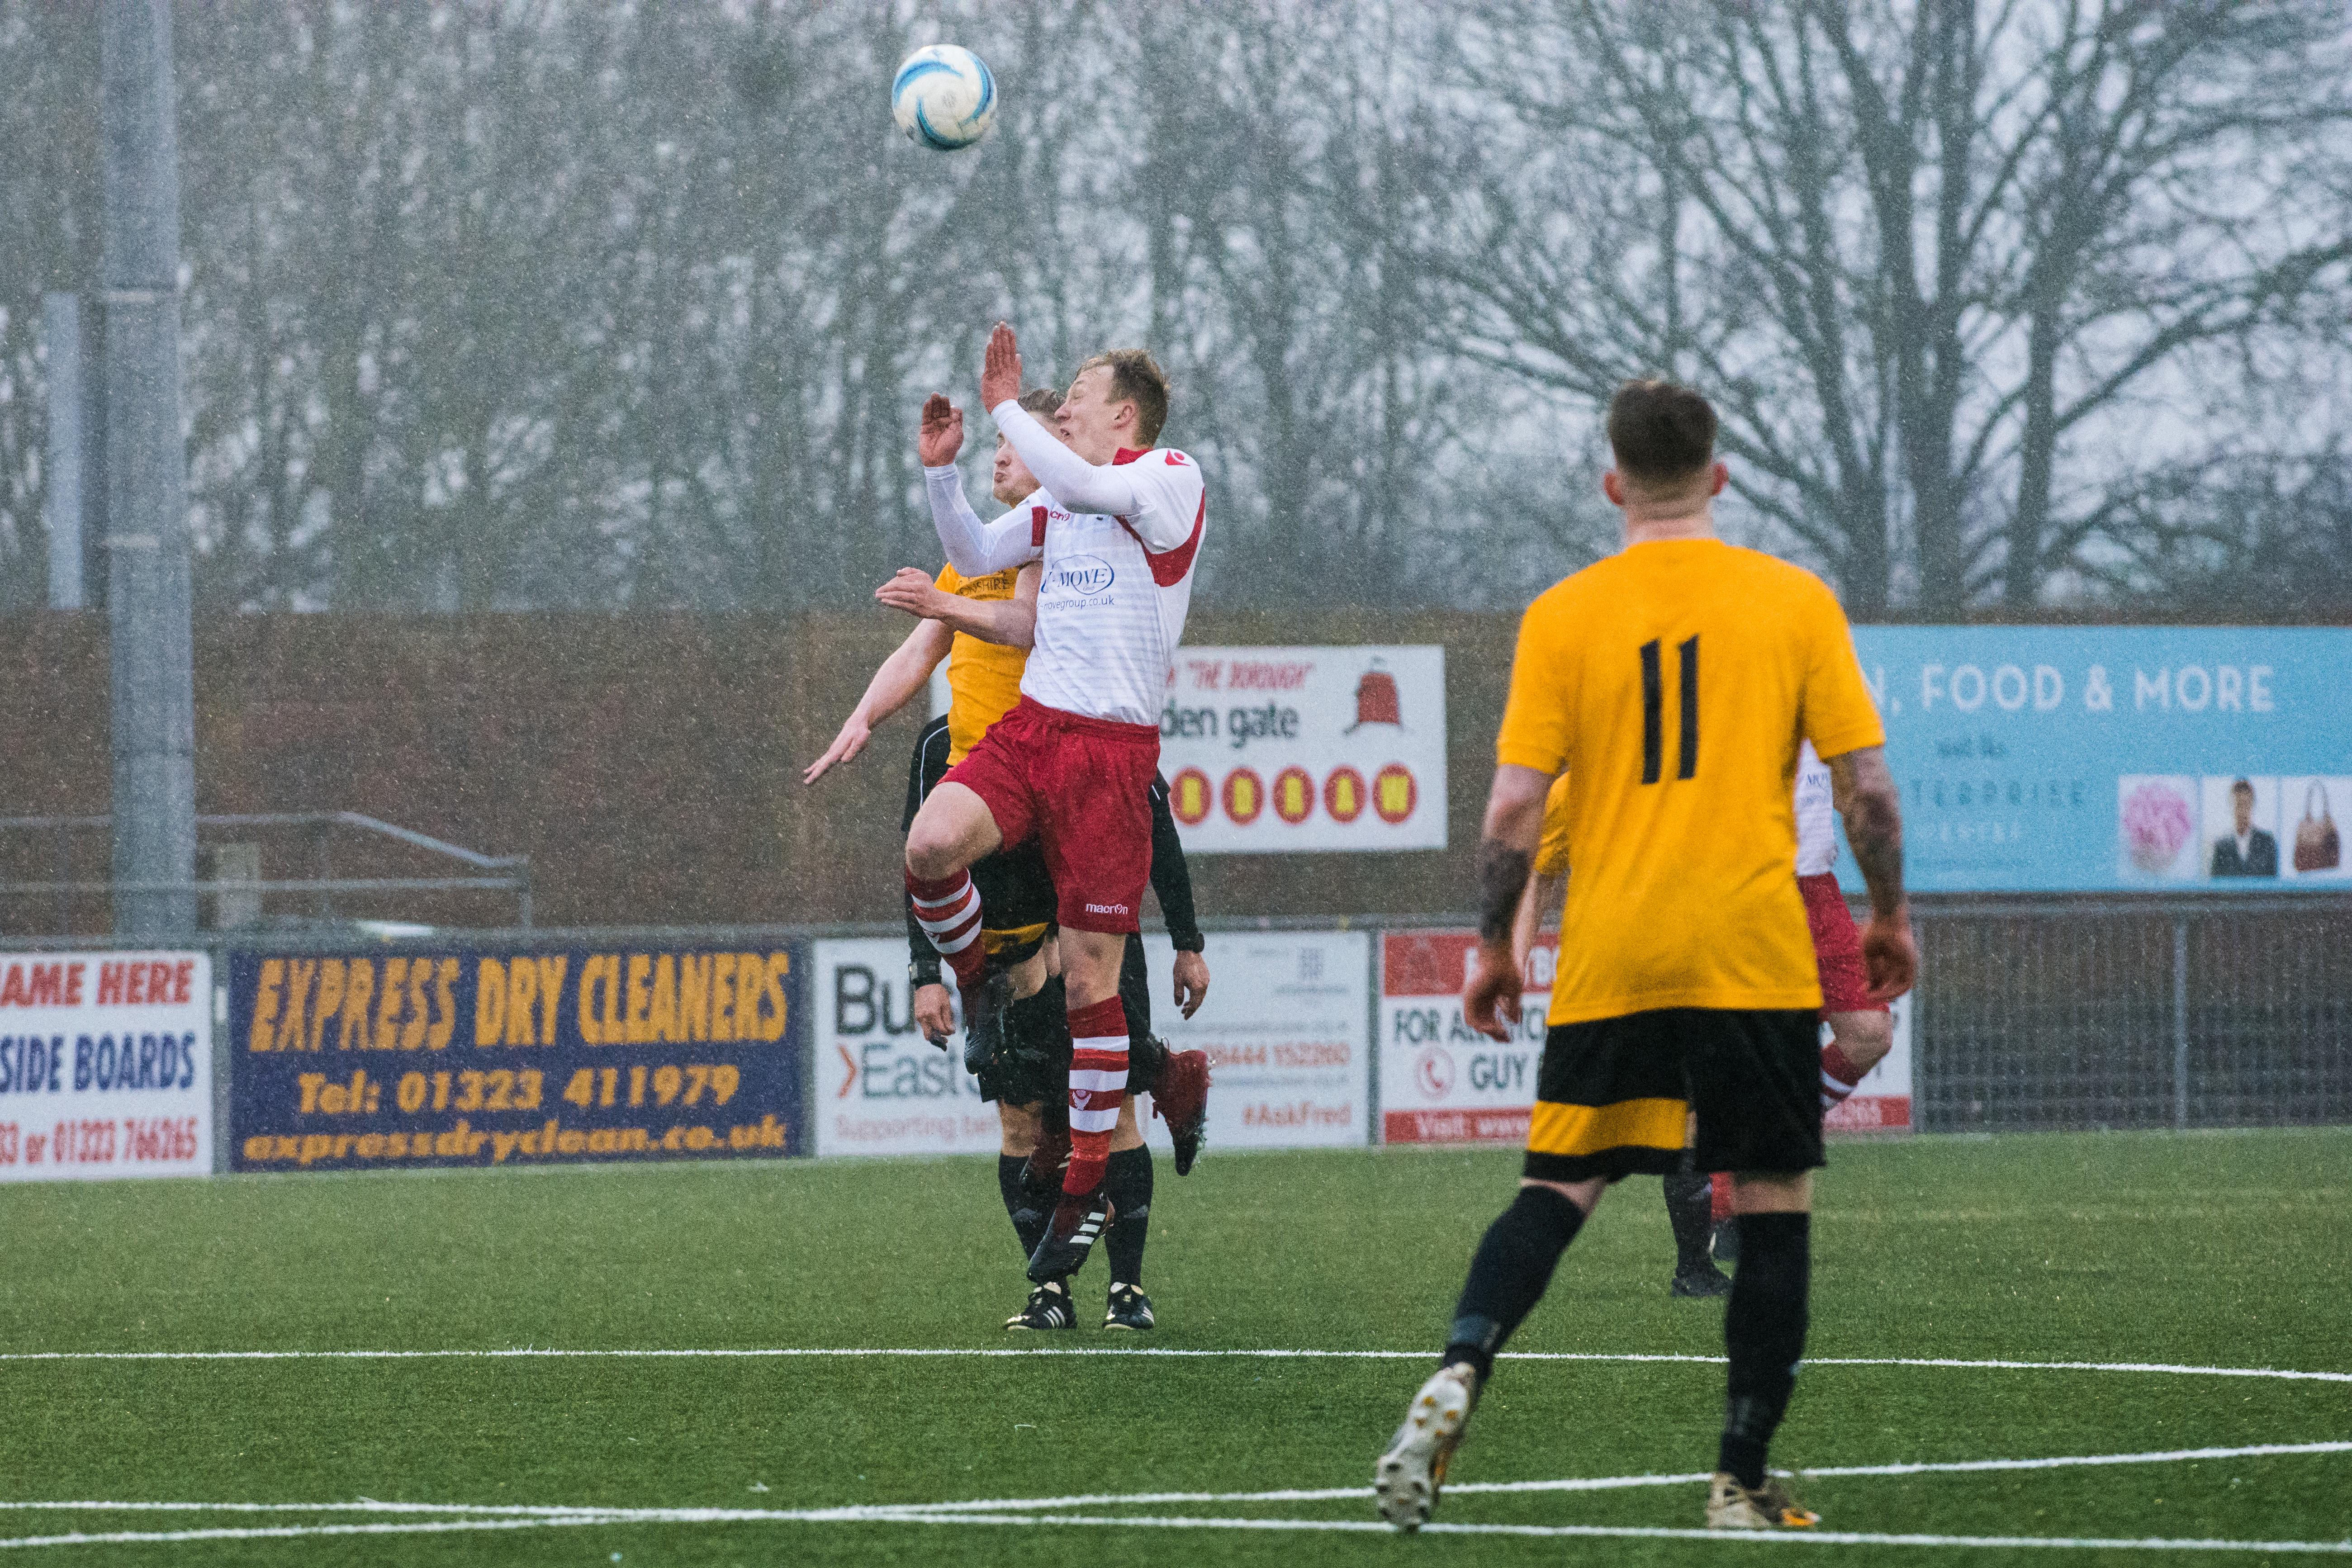 DAVID_JEFFERY Langney Wanderers FC vs Bexhill United FC 03.03.18 82